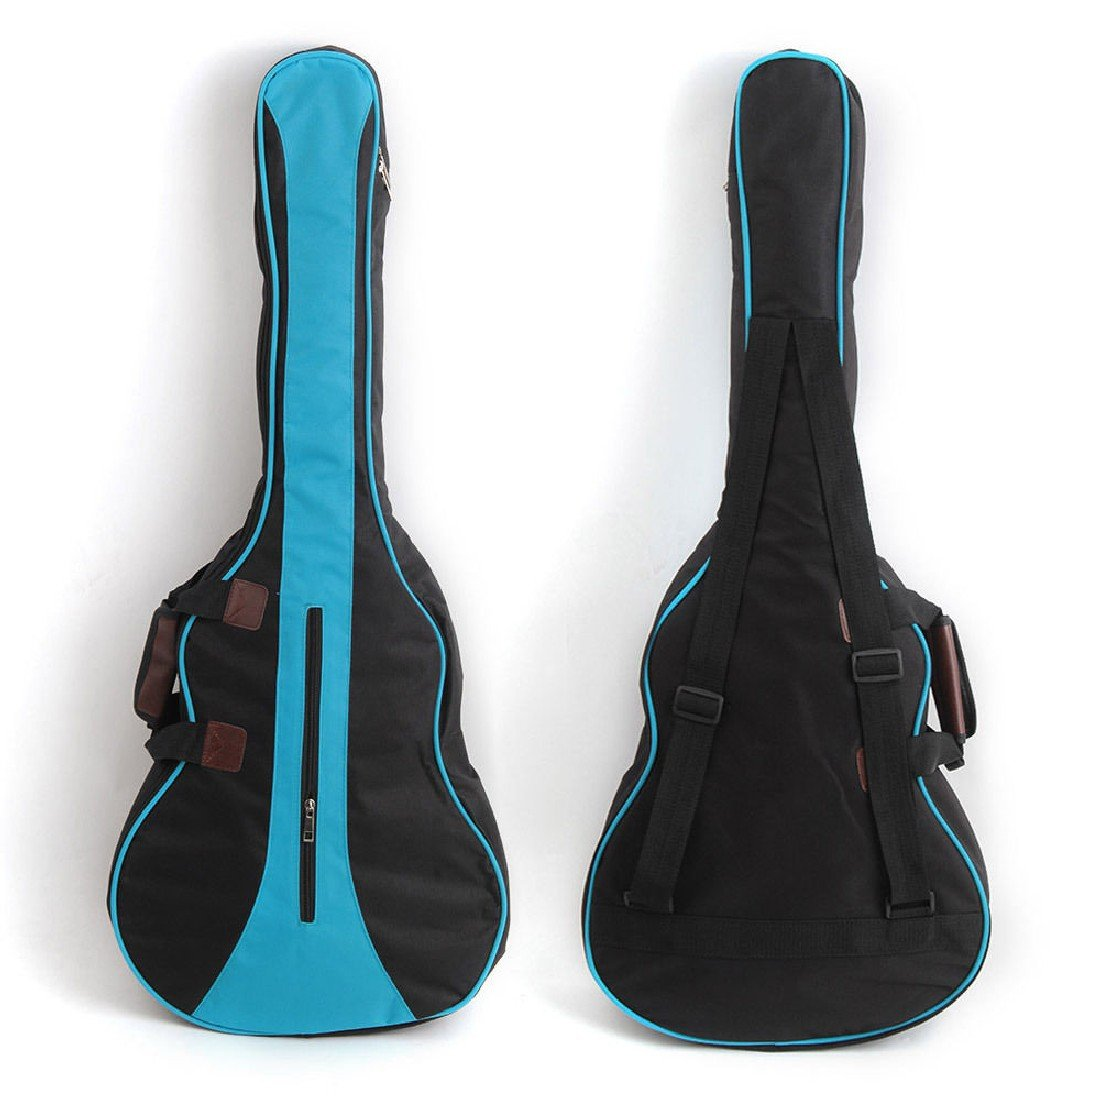 Funda protectora para guitarra 600D Oxford Cloth Backpack Big Bag For Ukulele Guitarra acústica Durable Black + Blue 36 ChenYao-Swansea